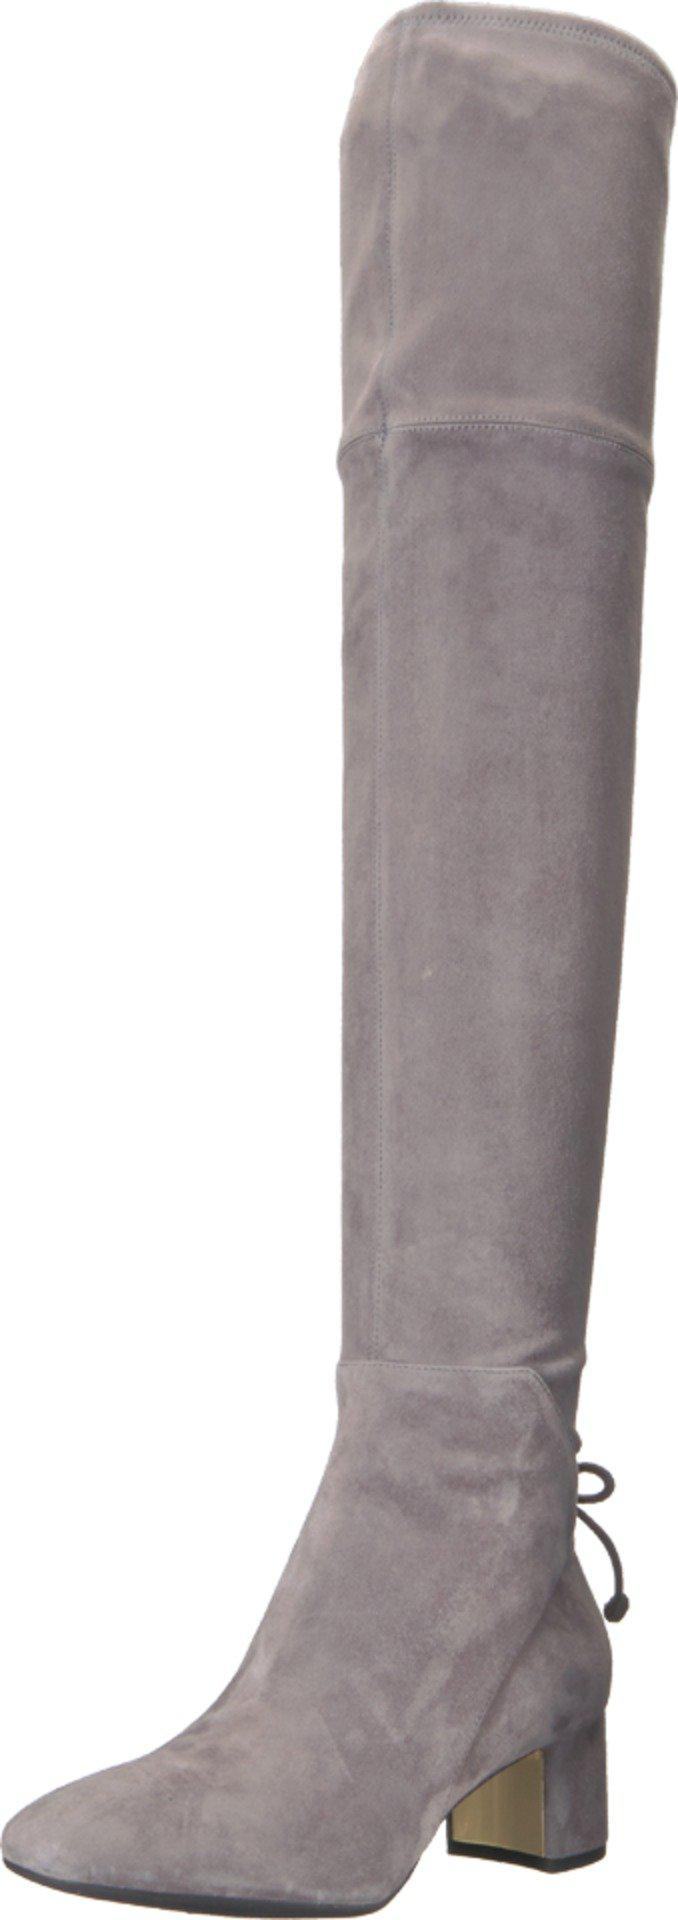 f934f063b67 Lyst - Tory Burch Laila 45mm Over The Knee